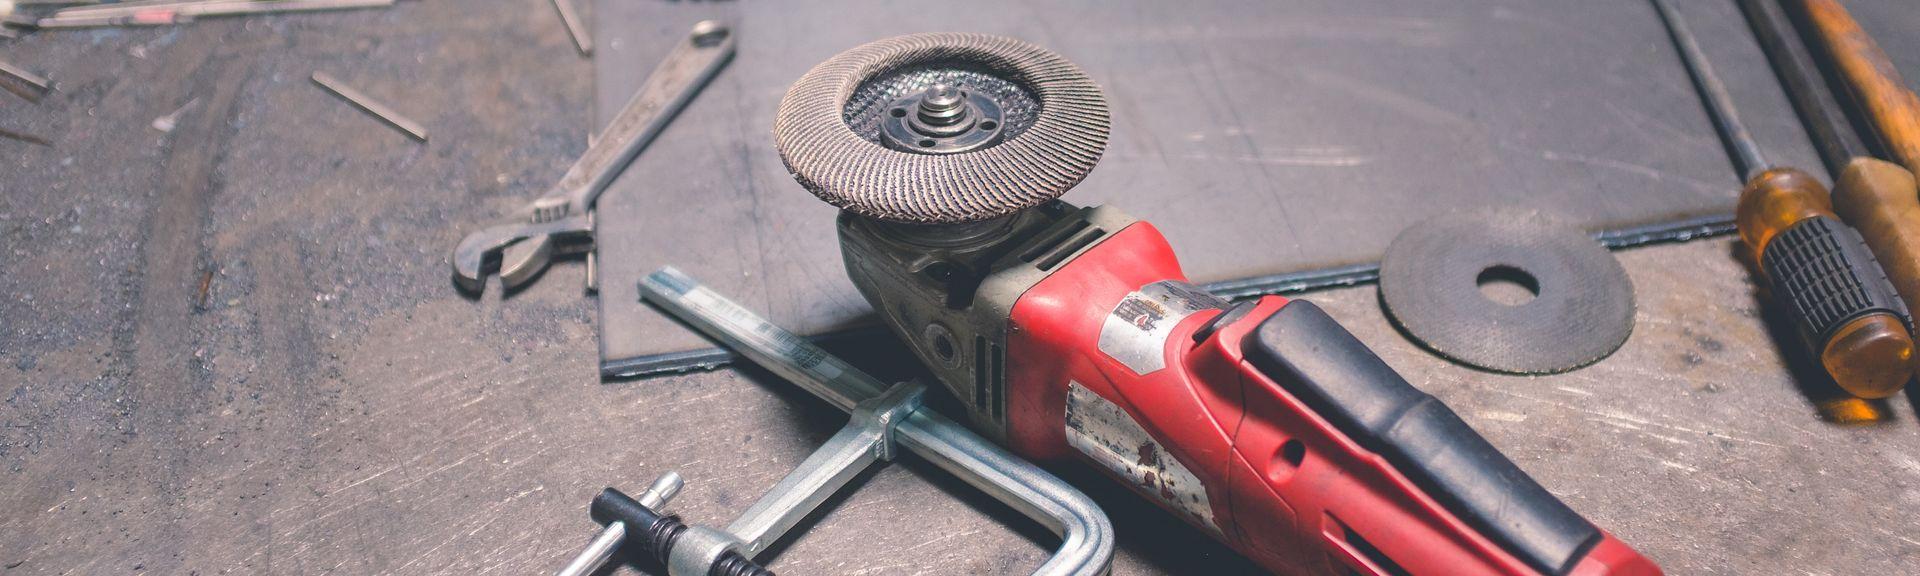 Almeria Builders - Builder's tools